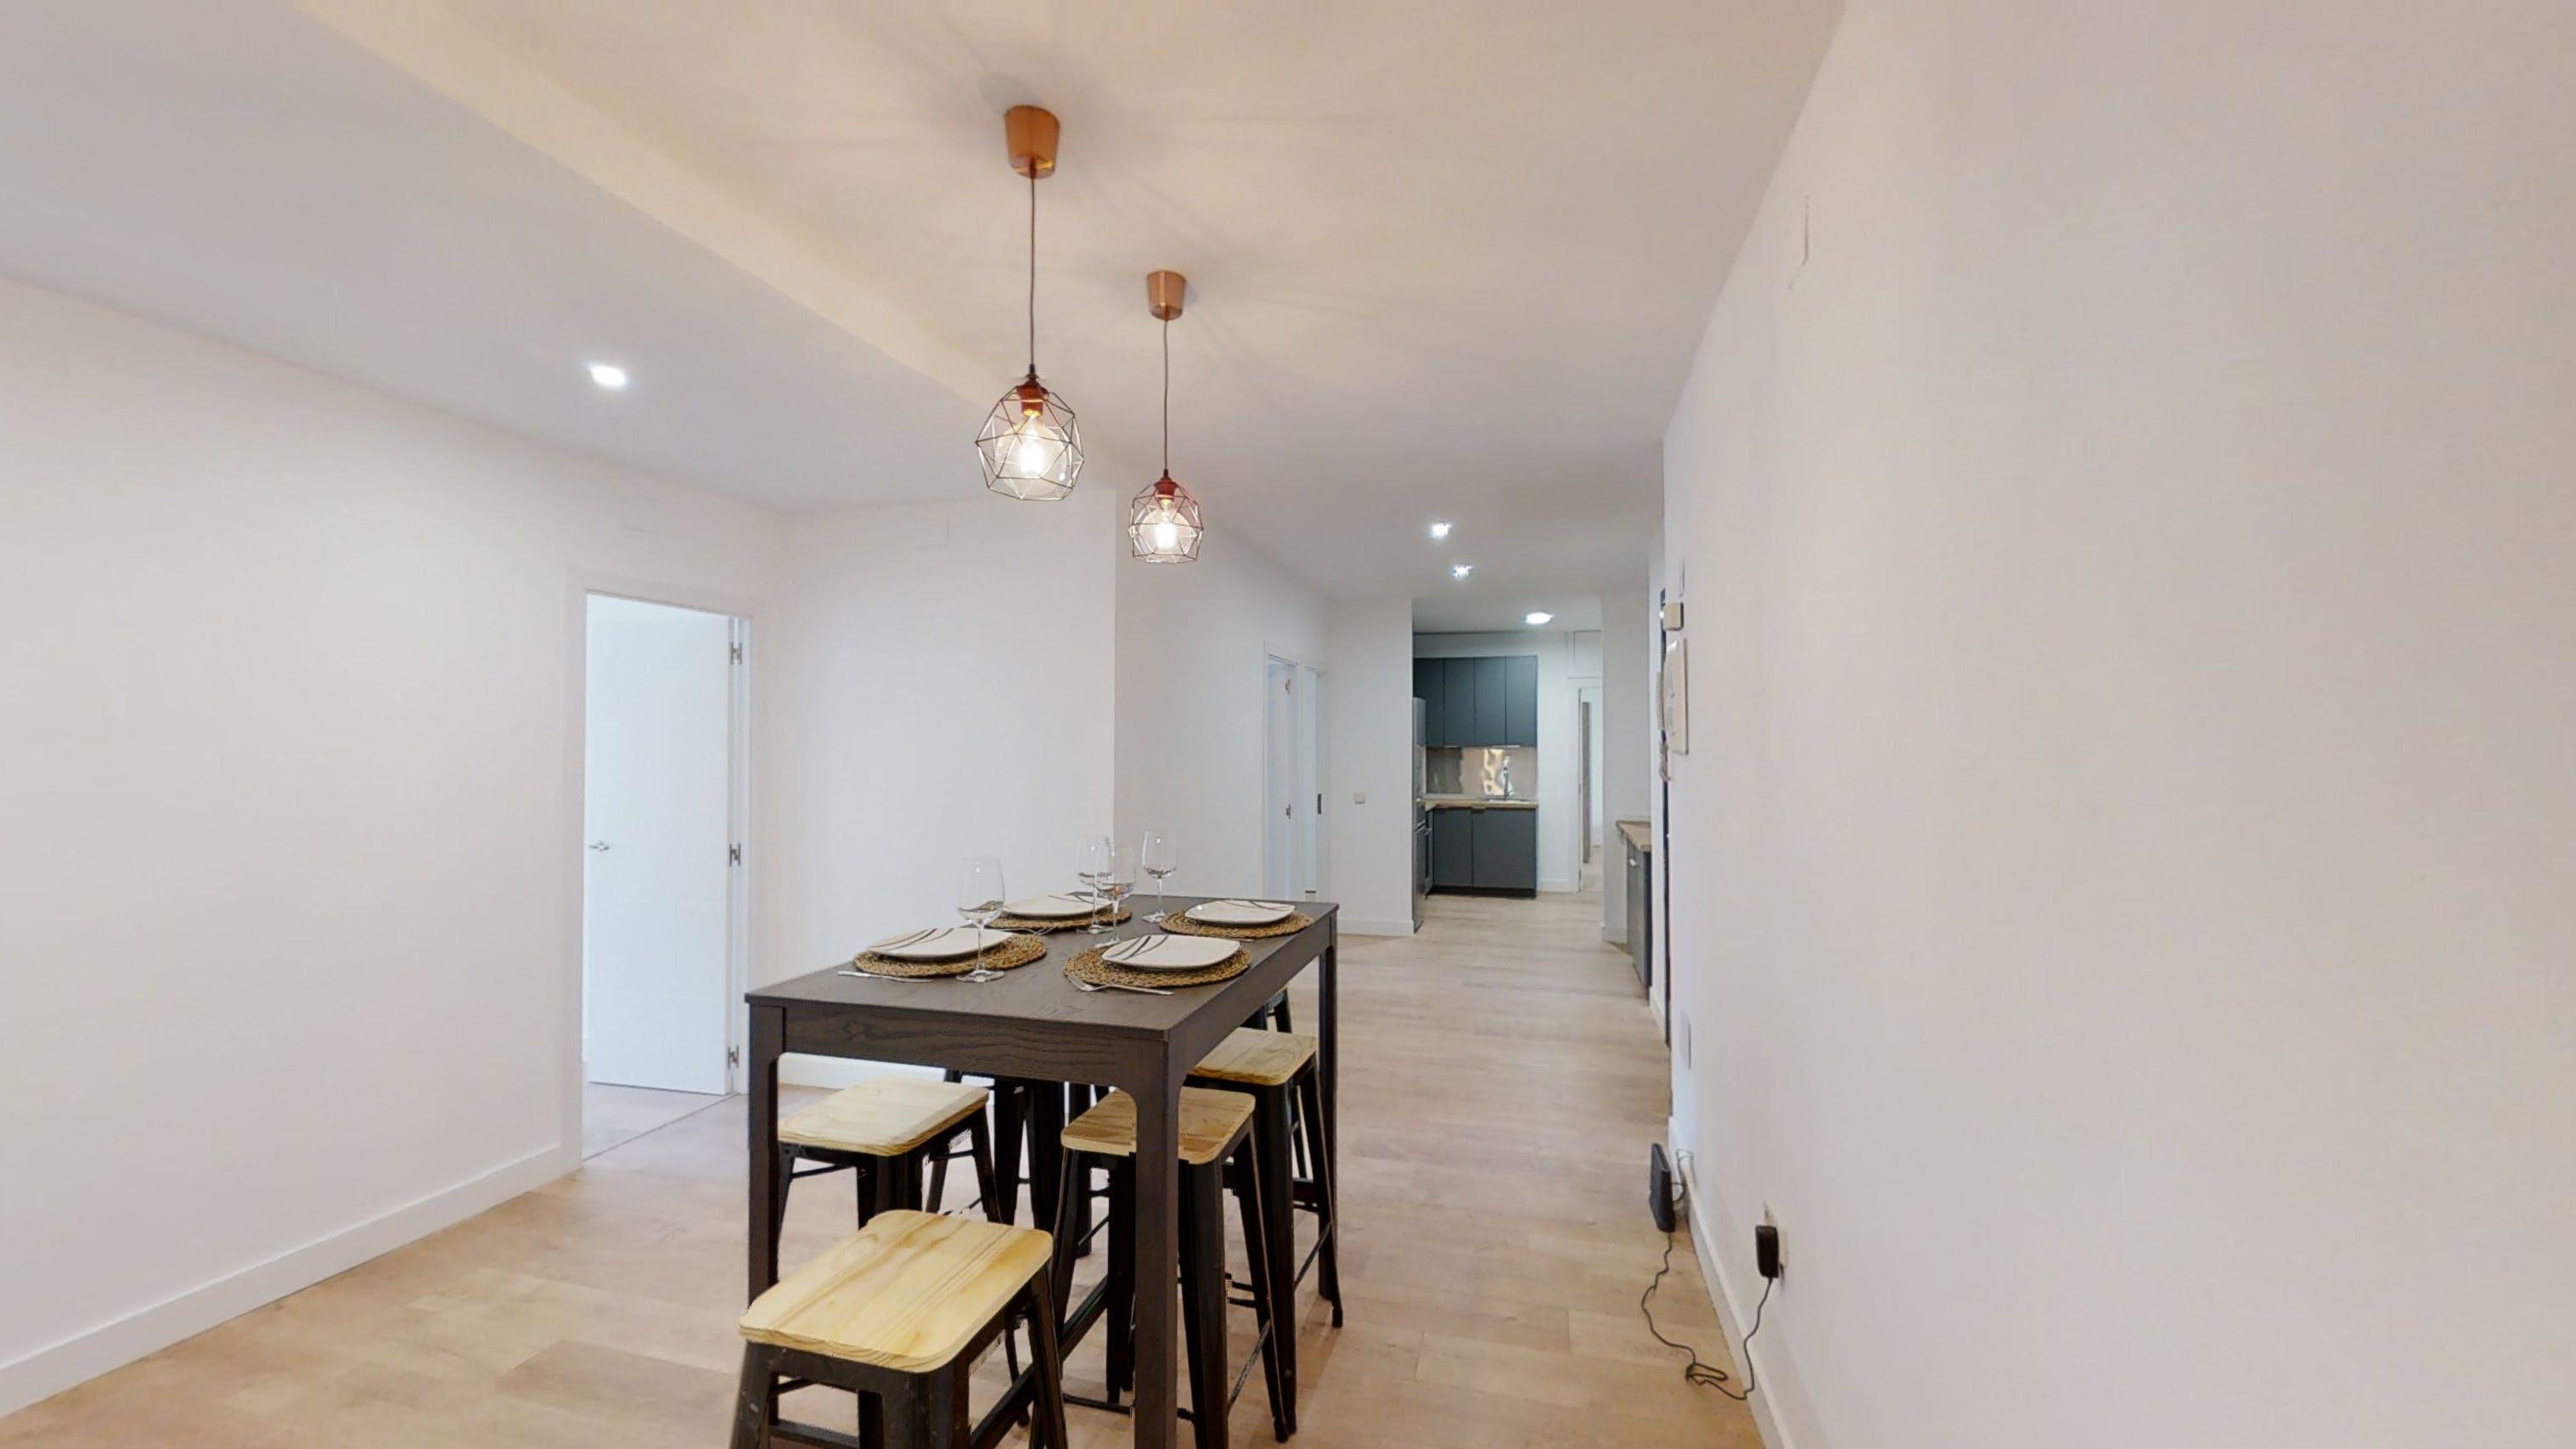 7 Residents   Almagro - Chamberi   Cozy Modern Apt. w/ Large Workspace